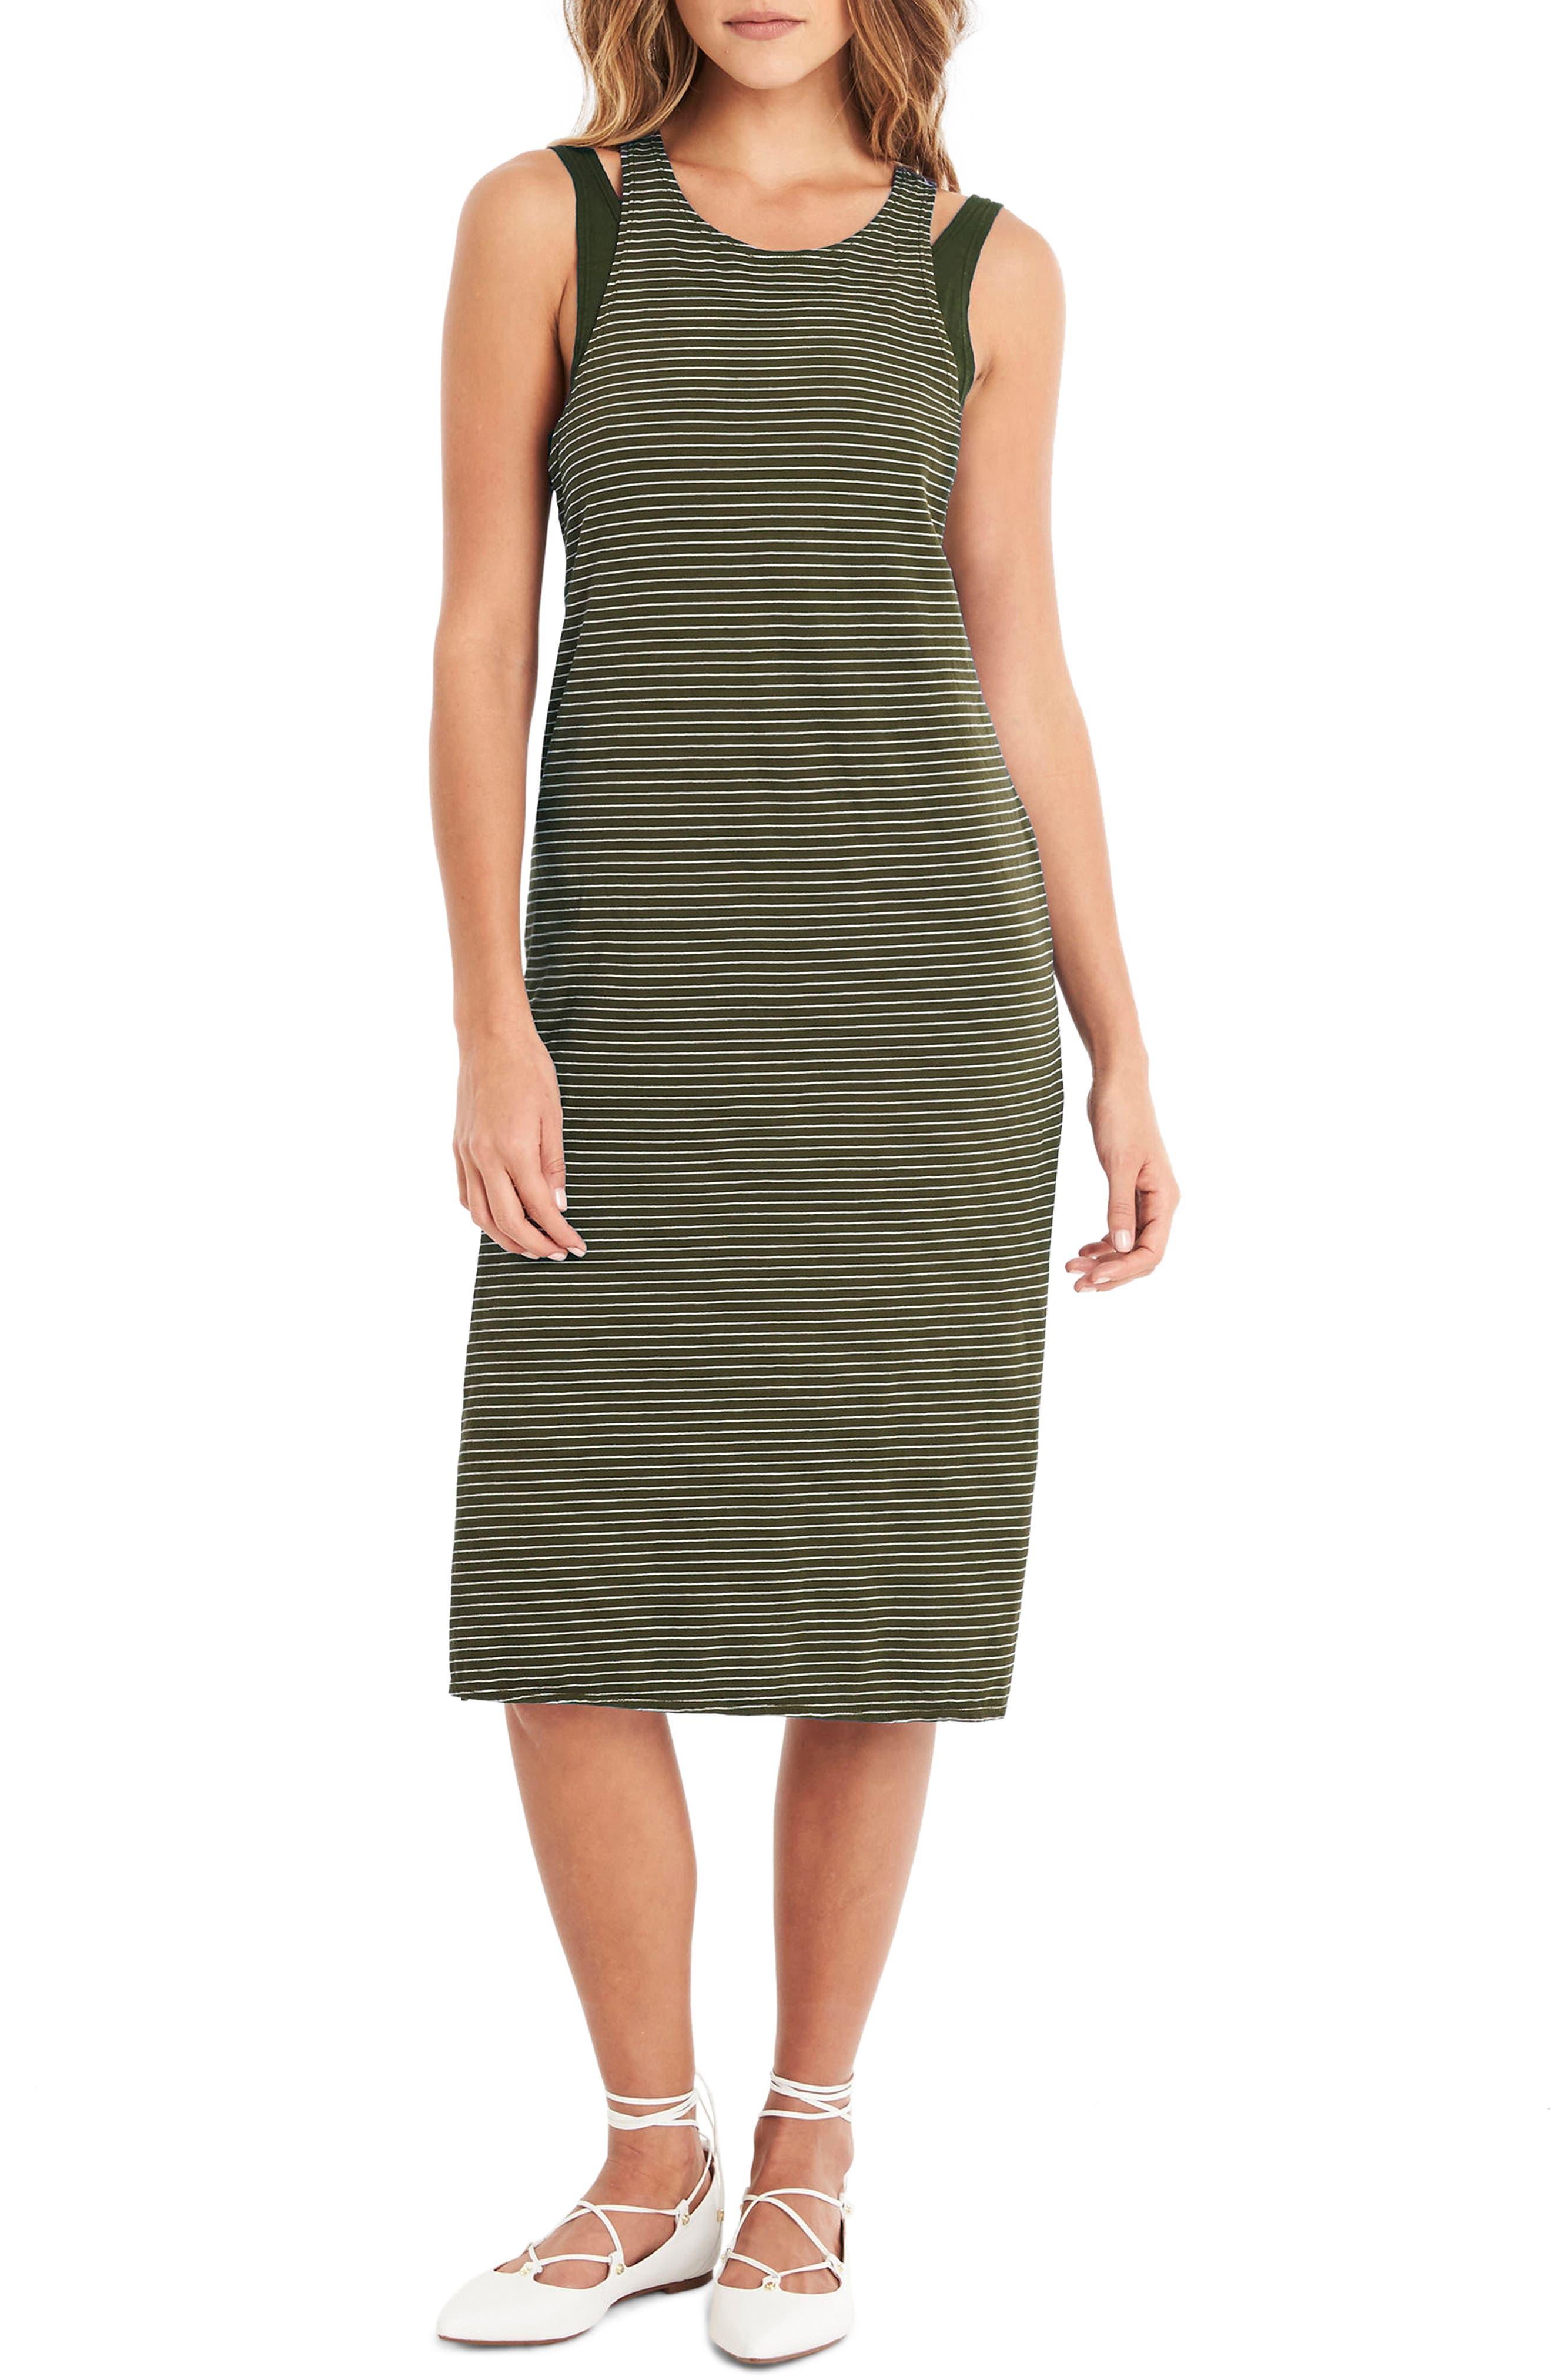 MICHAEL STARS Layered Knit Tank Dress